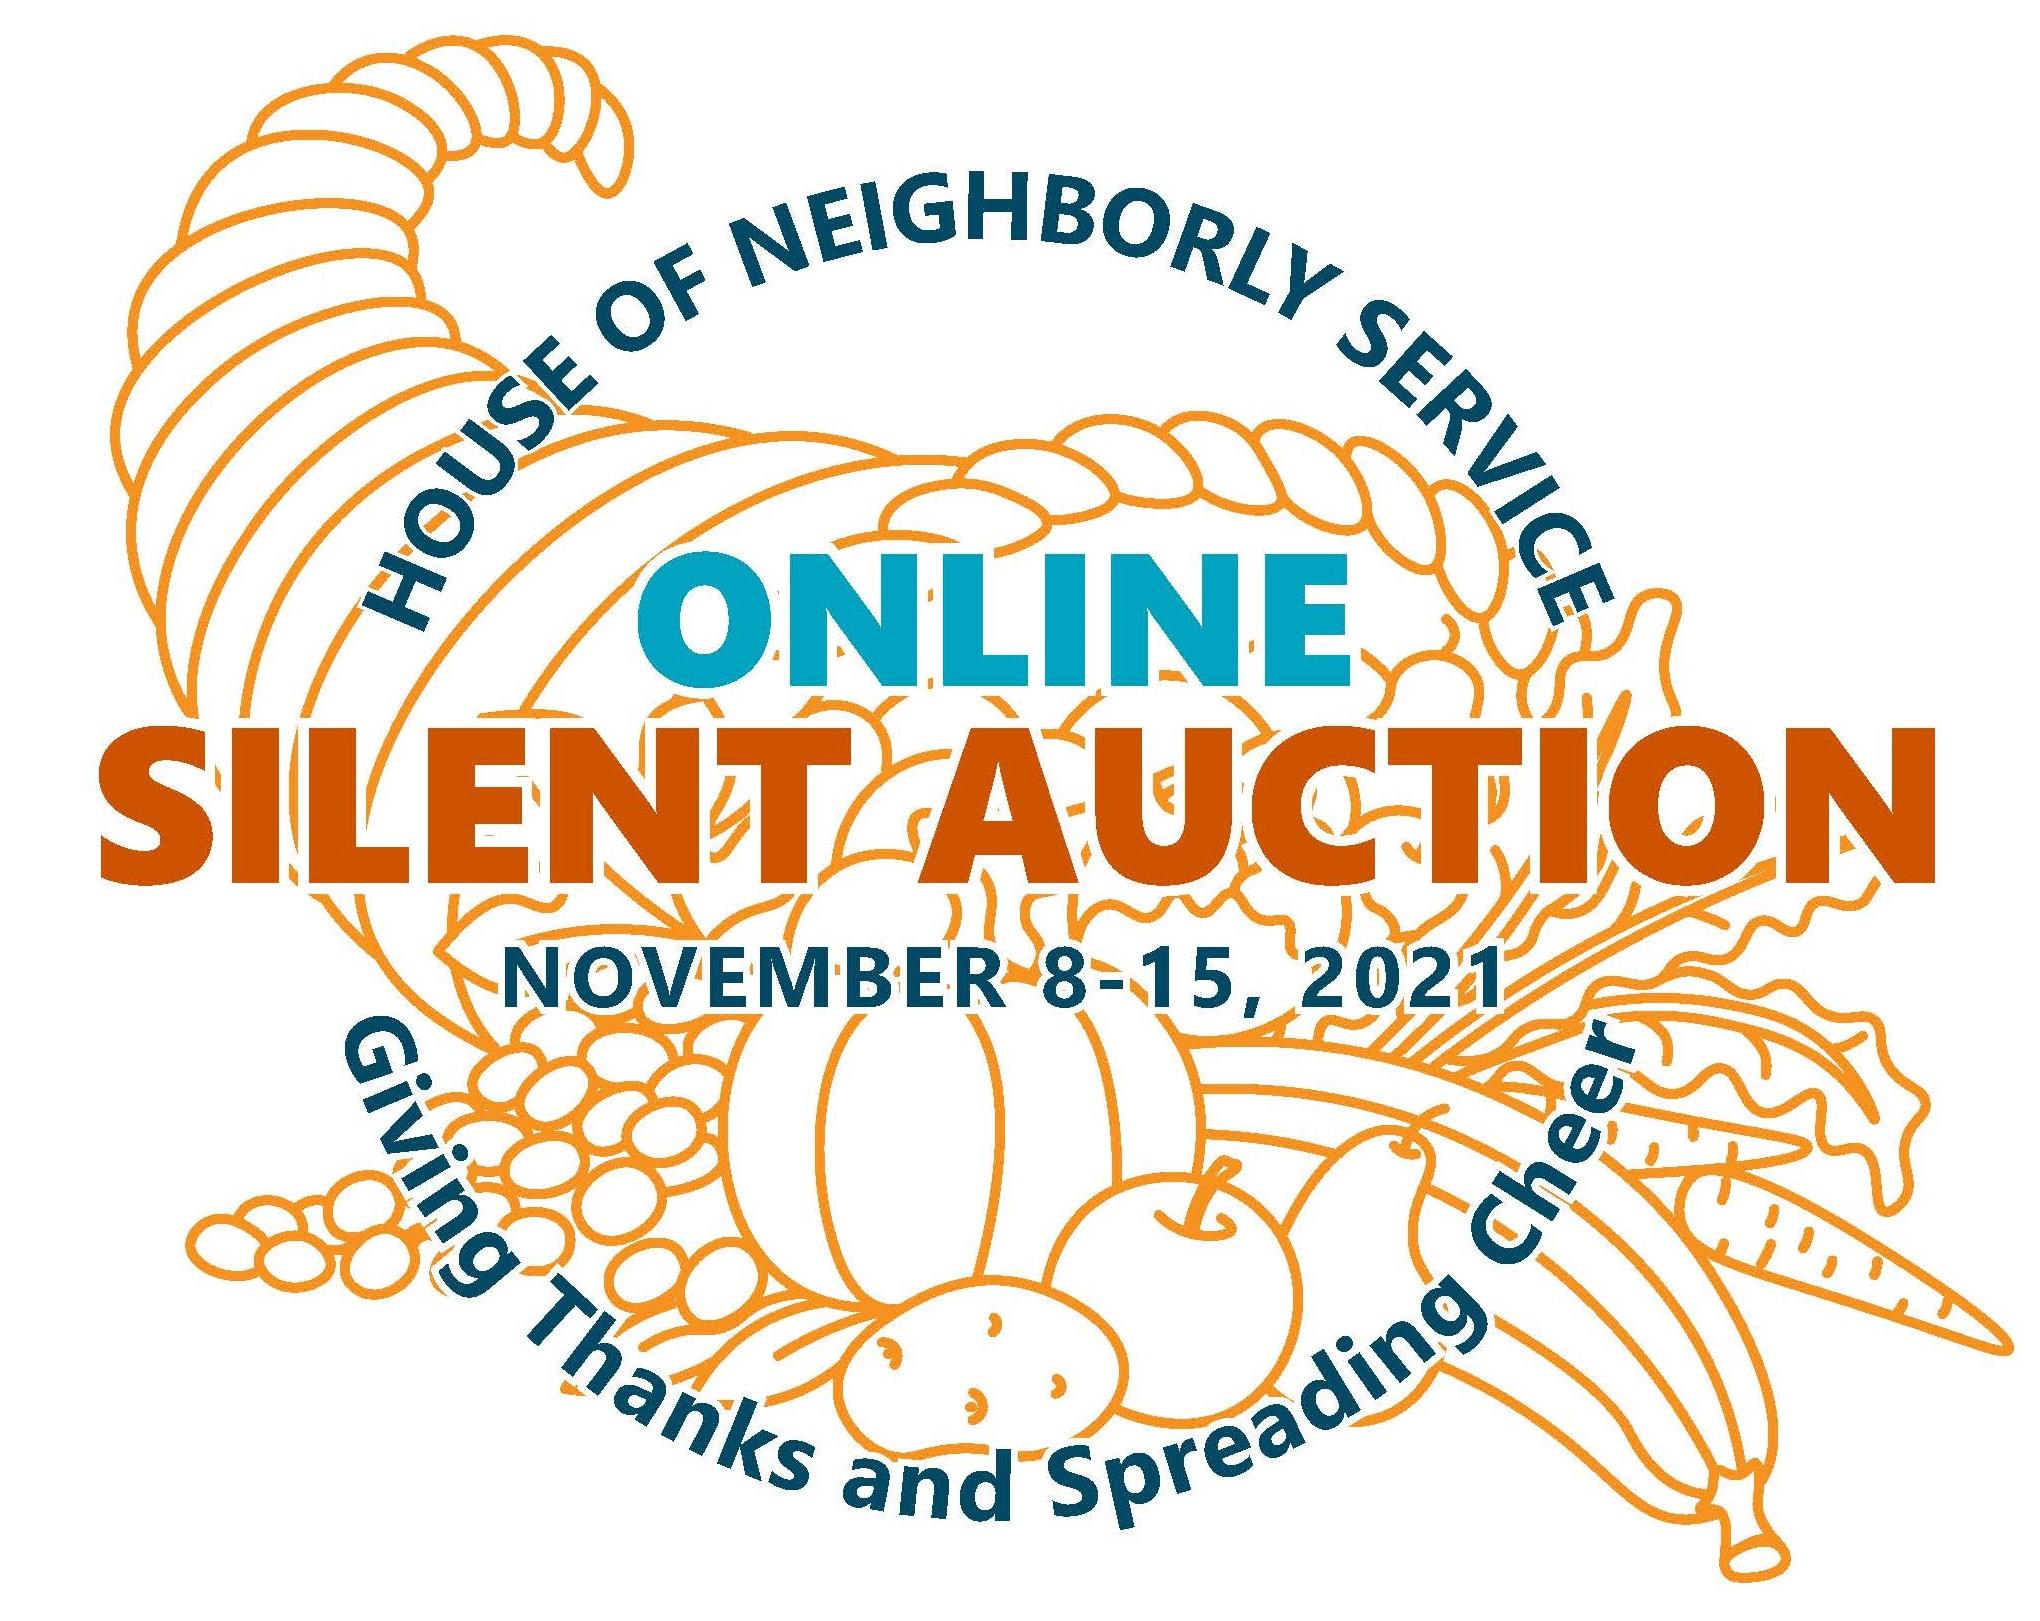 Online Silent Auction November 8-15, 2021